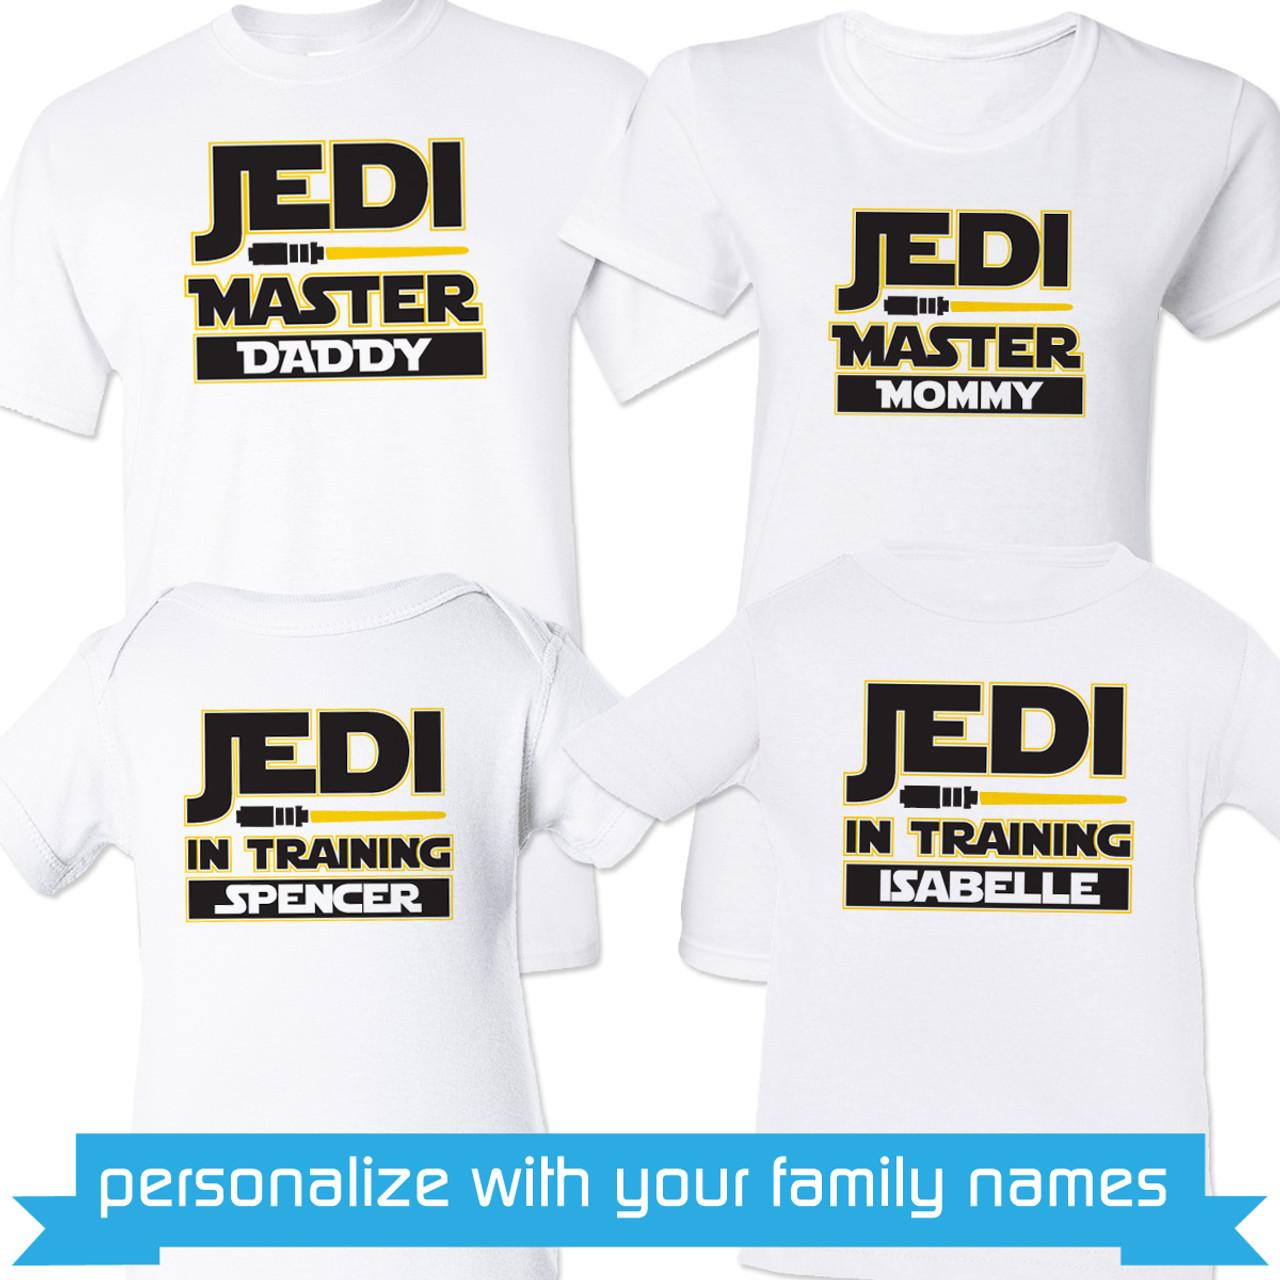 8a15df75e489 Personalized Jedi Family Shirts